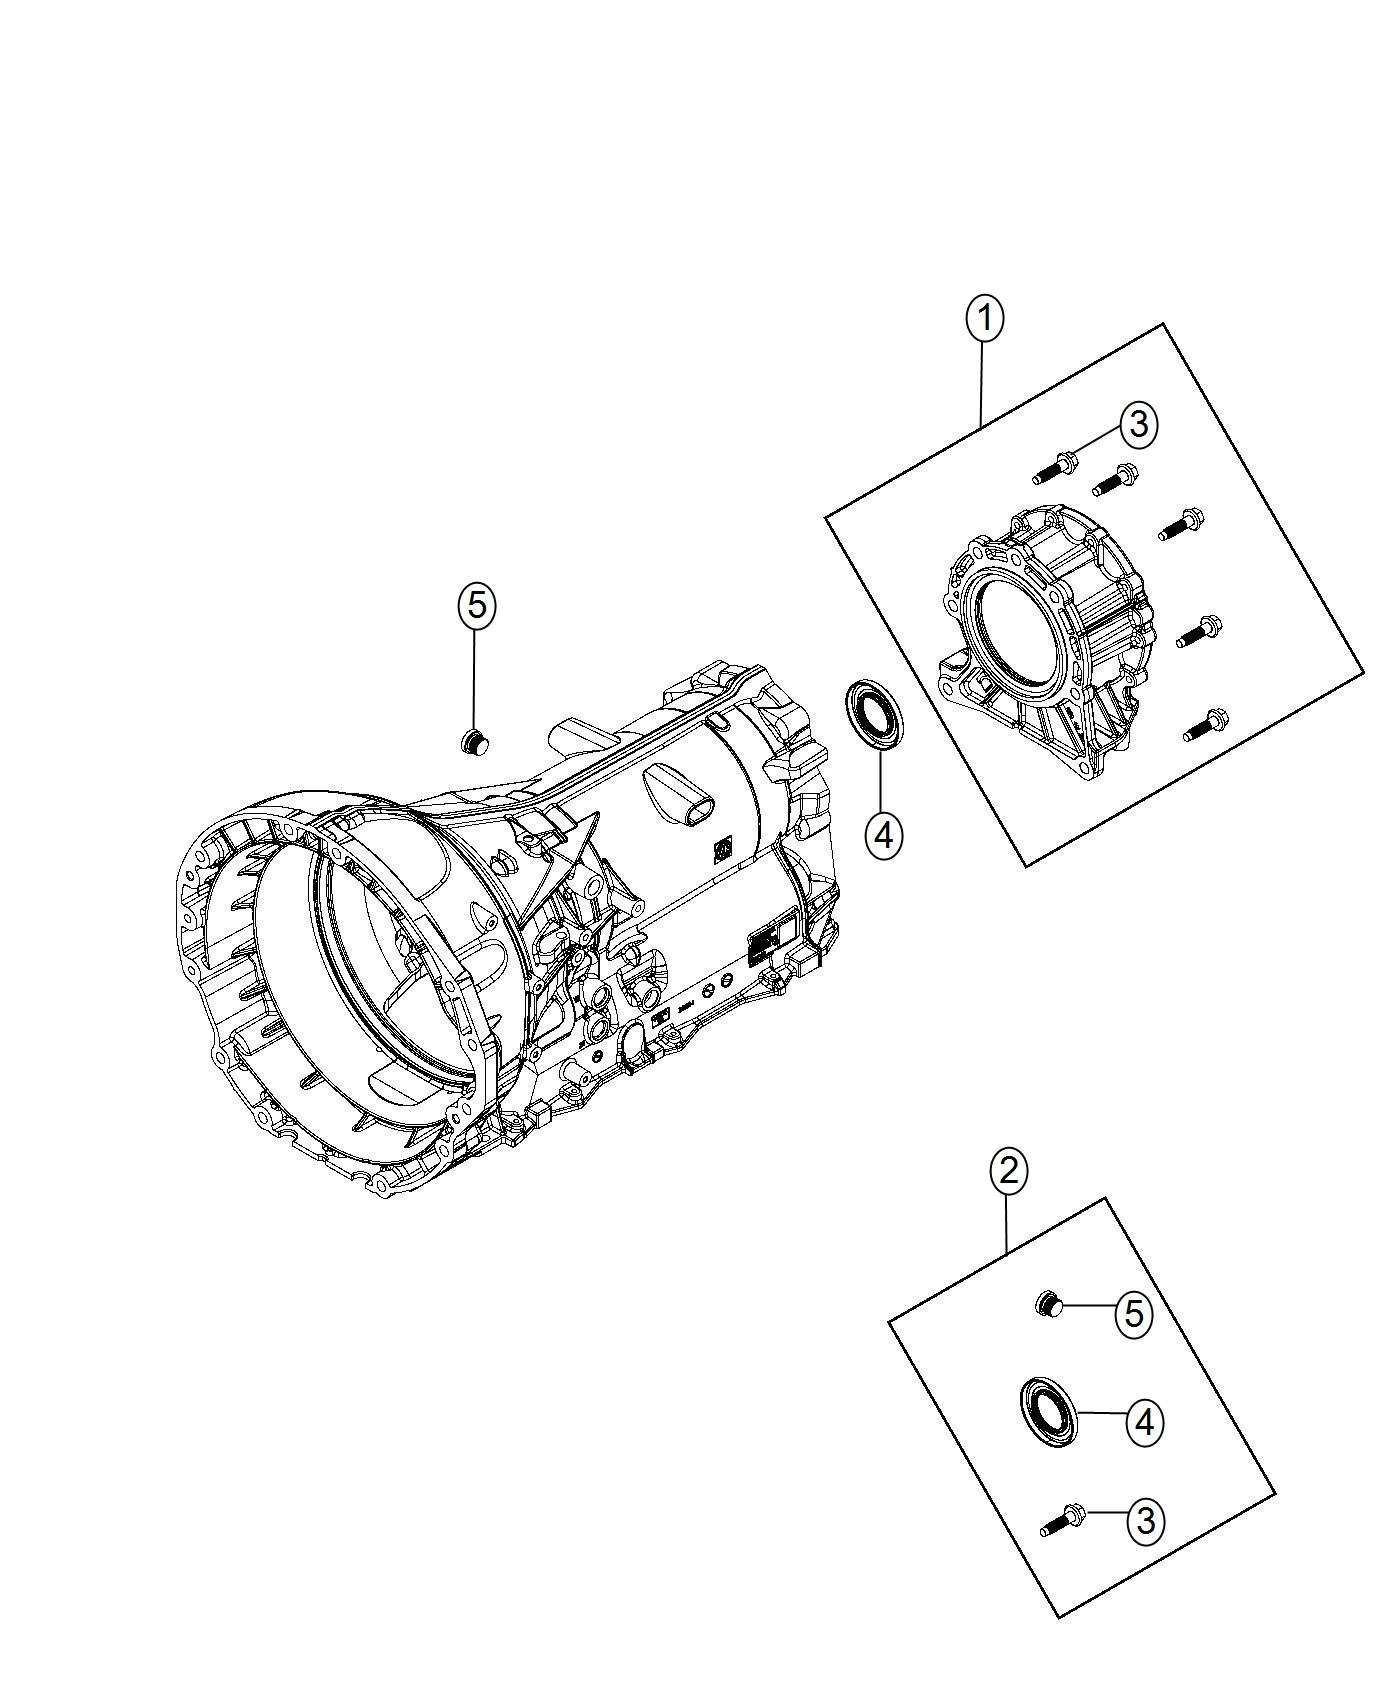 Dodge Durango Adapter Transfer Case